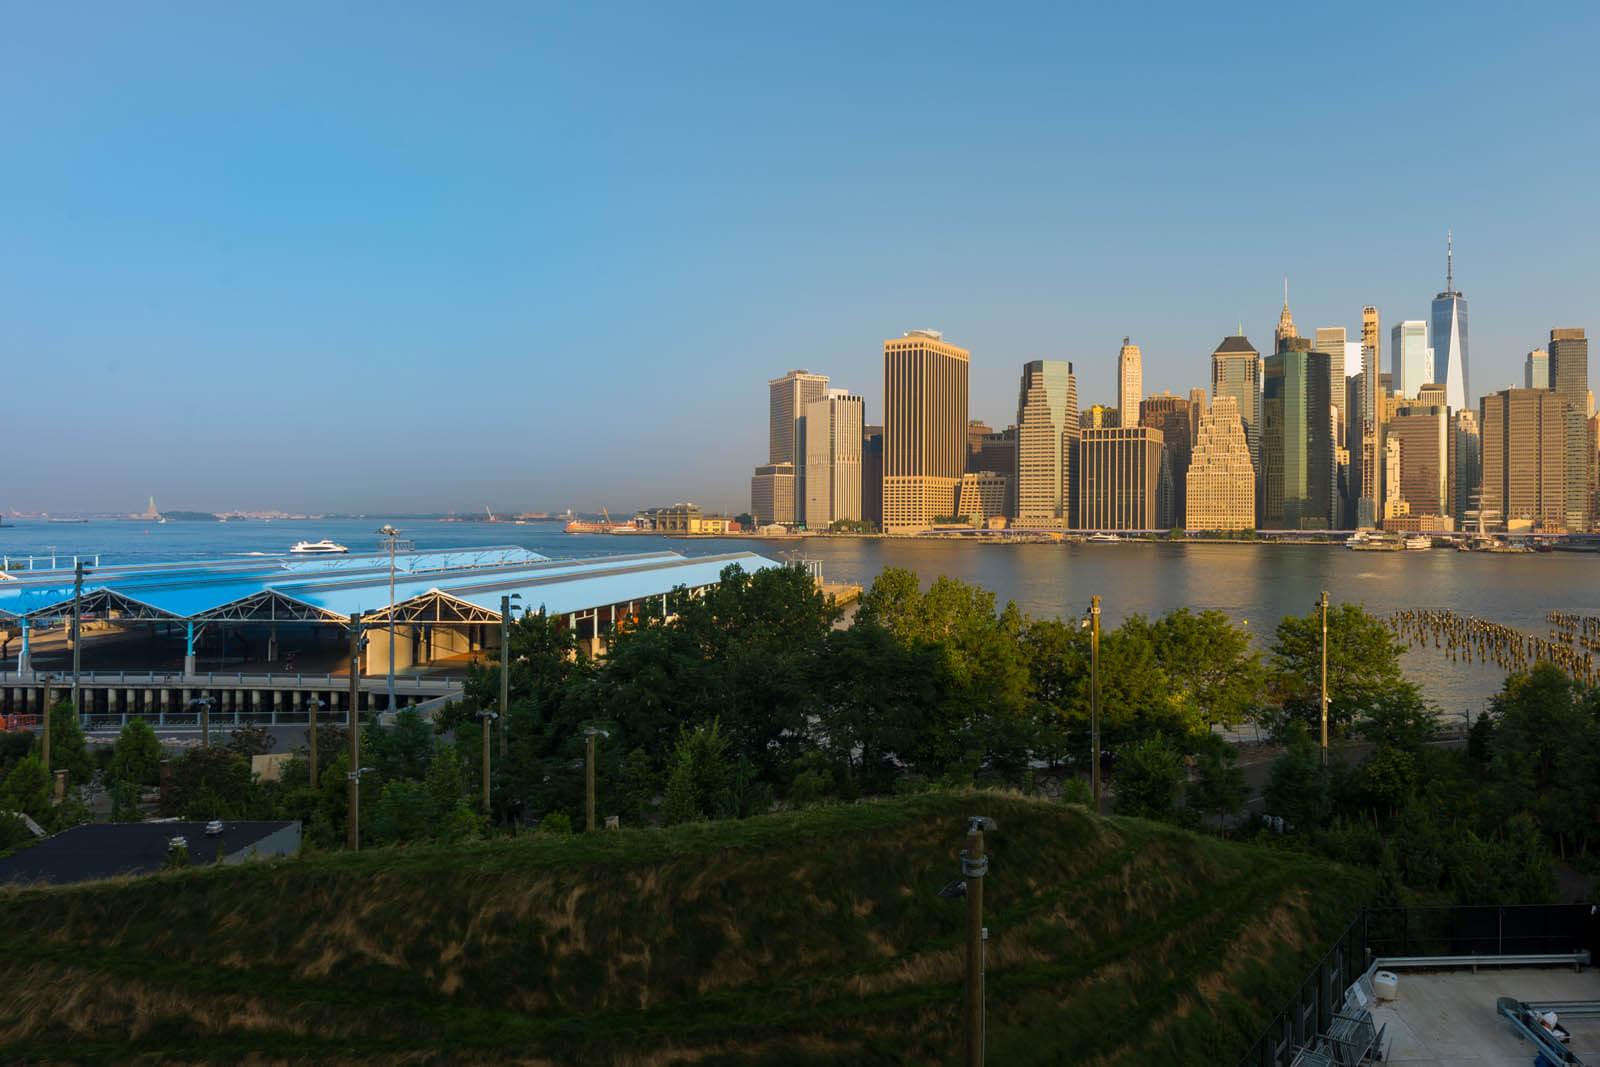 Brooklyn Bridge Park pier view along the East River from Brooklyn Heights Promenade